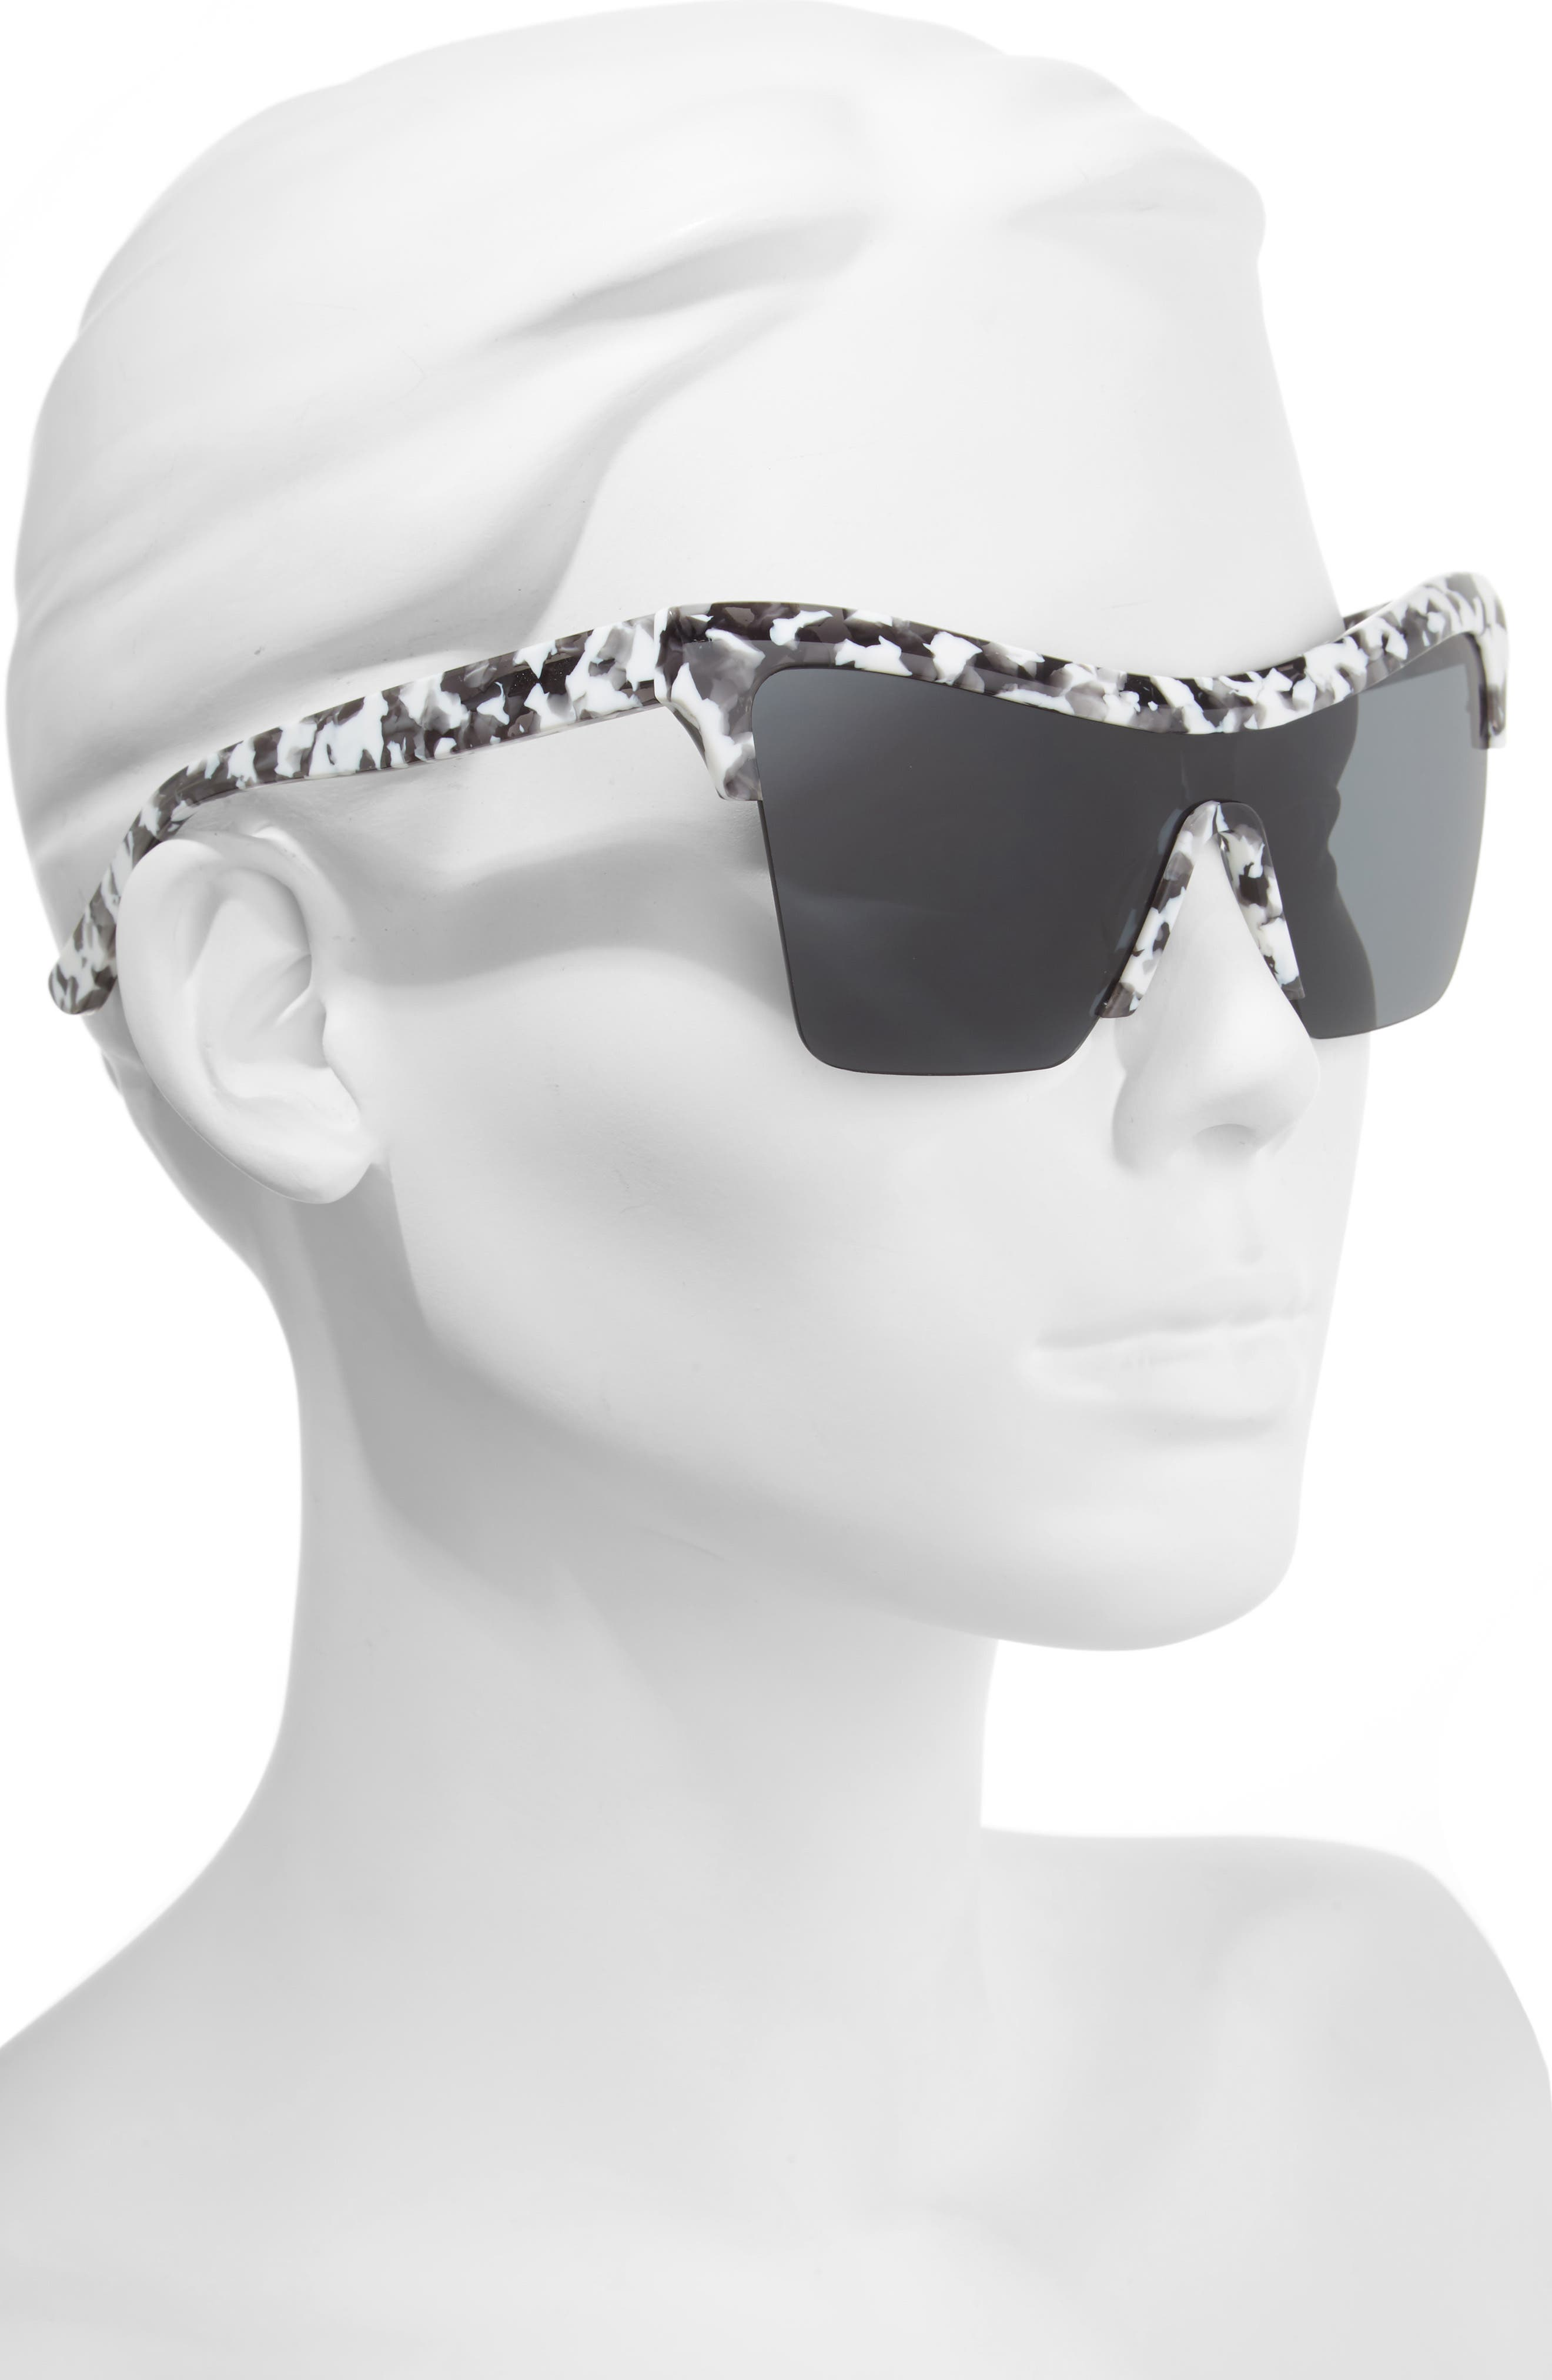 Passport Control 68mm Sunglasses,                             Alternate thumbnail 2, color,                             WHITE CAMO